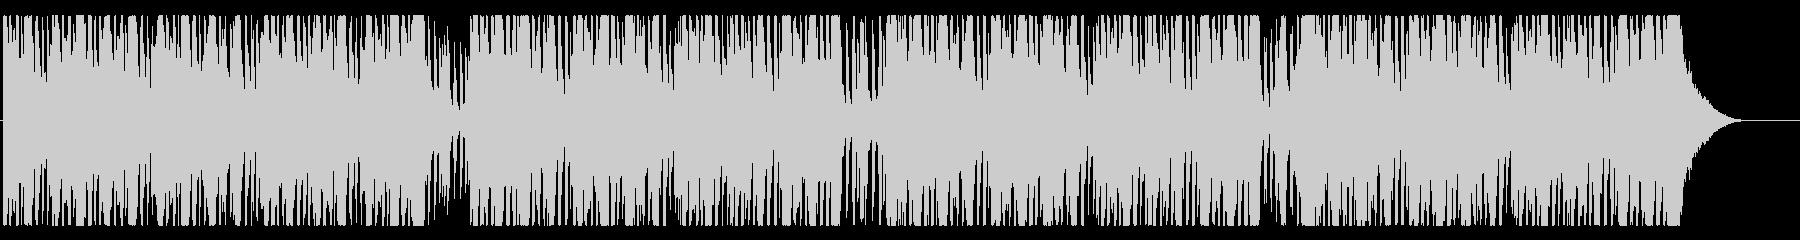 LIVE SE向き ROCK系 BGMの未再生の波形